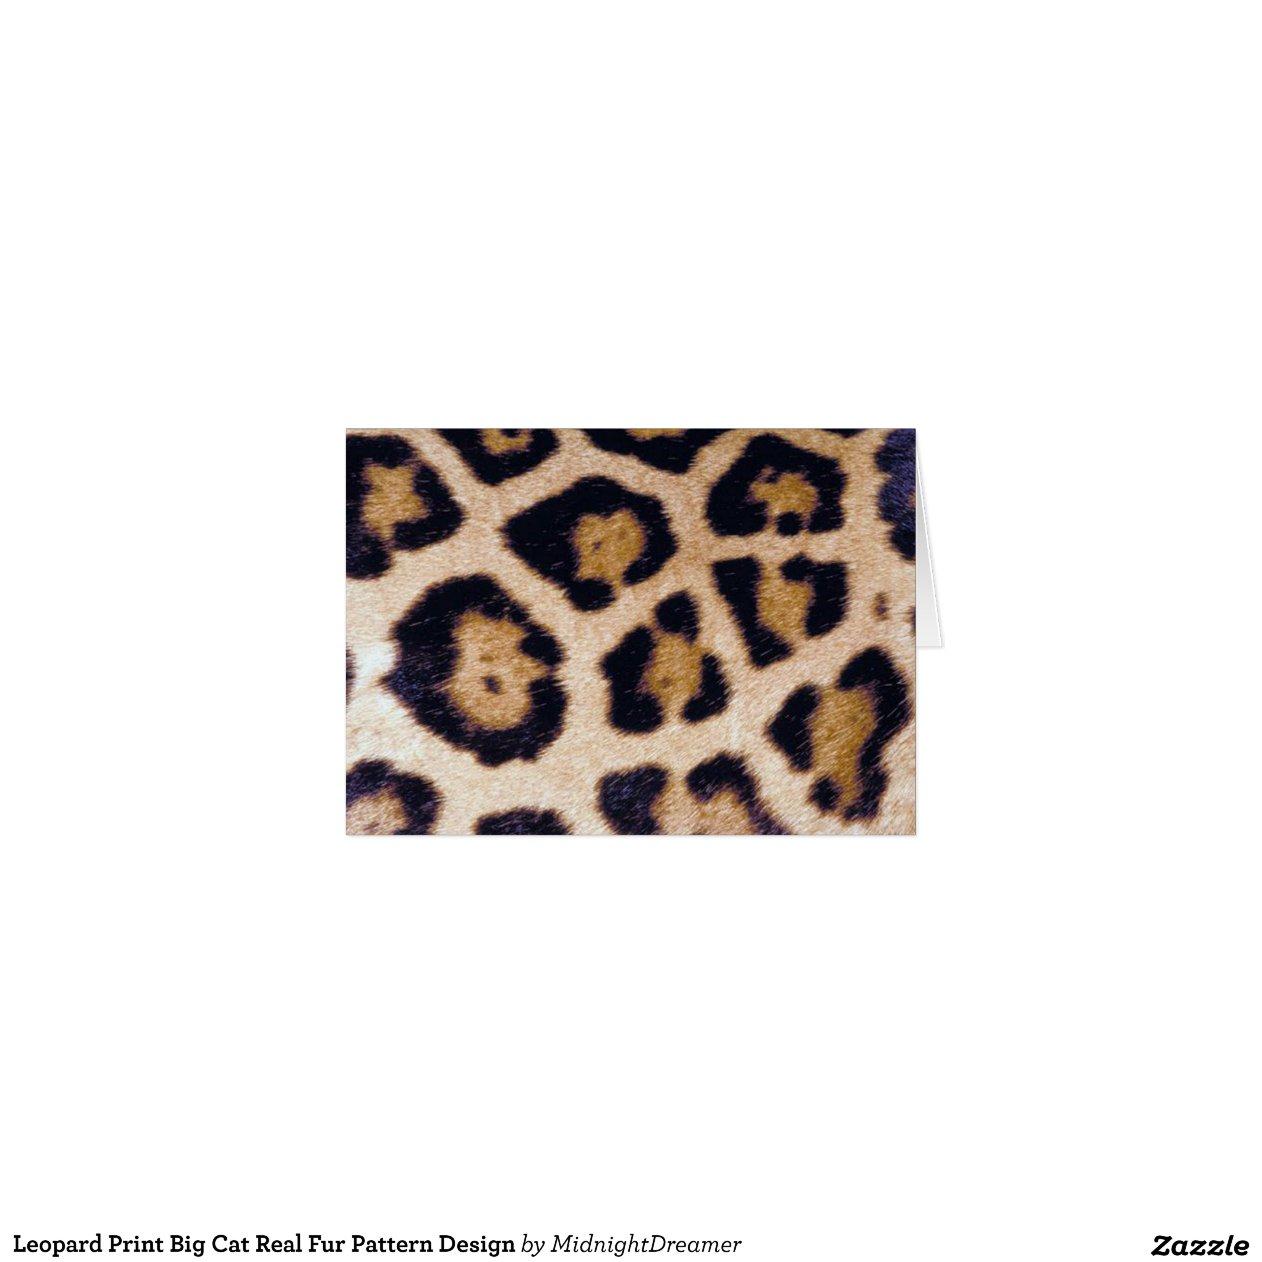 Leopard Print Big Cat Real Fur Pattern Design | Zazzle